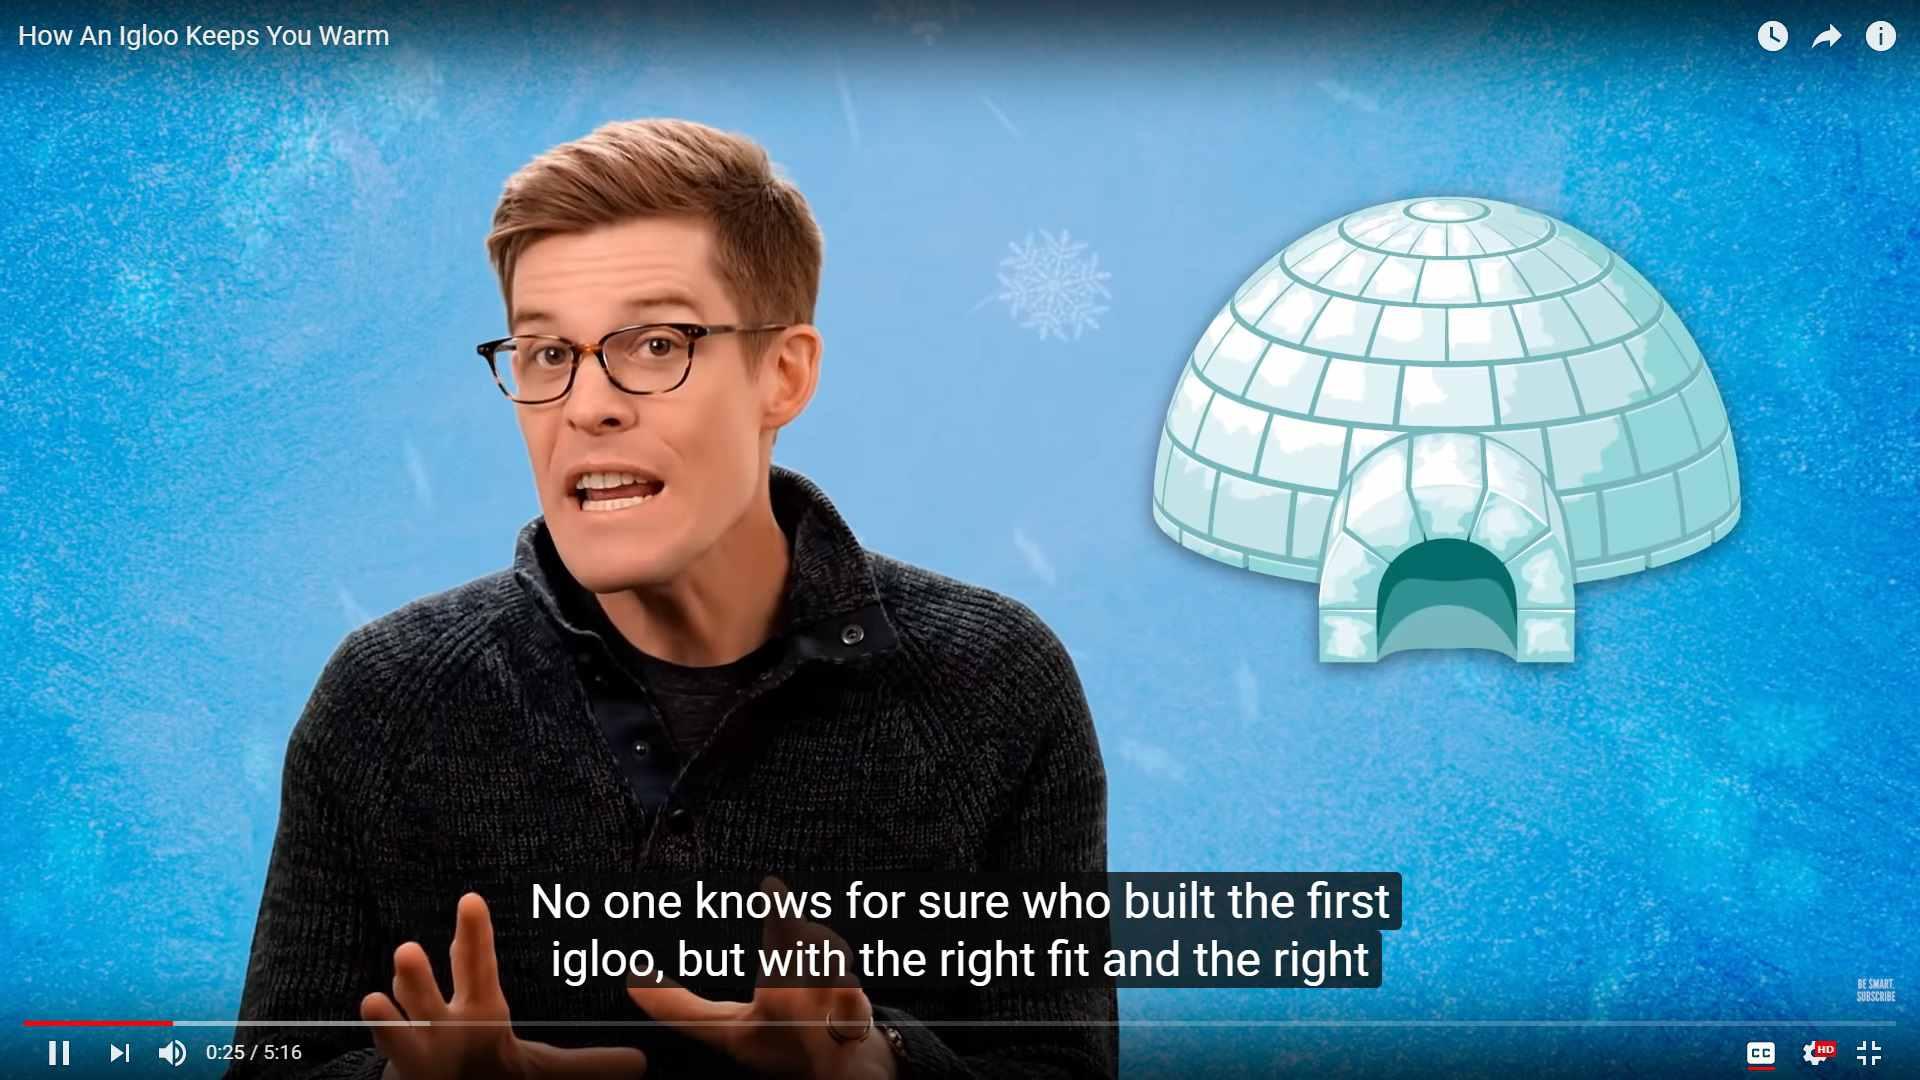 Joe Hanson explaining how igloos keep people warm in front of an illustration of an igloo